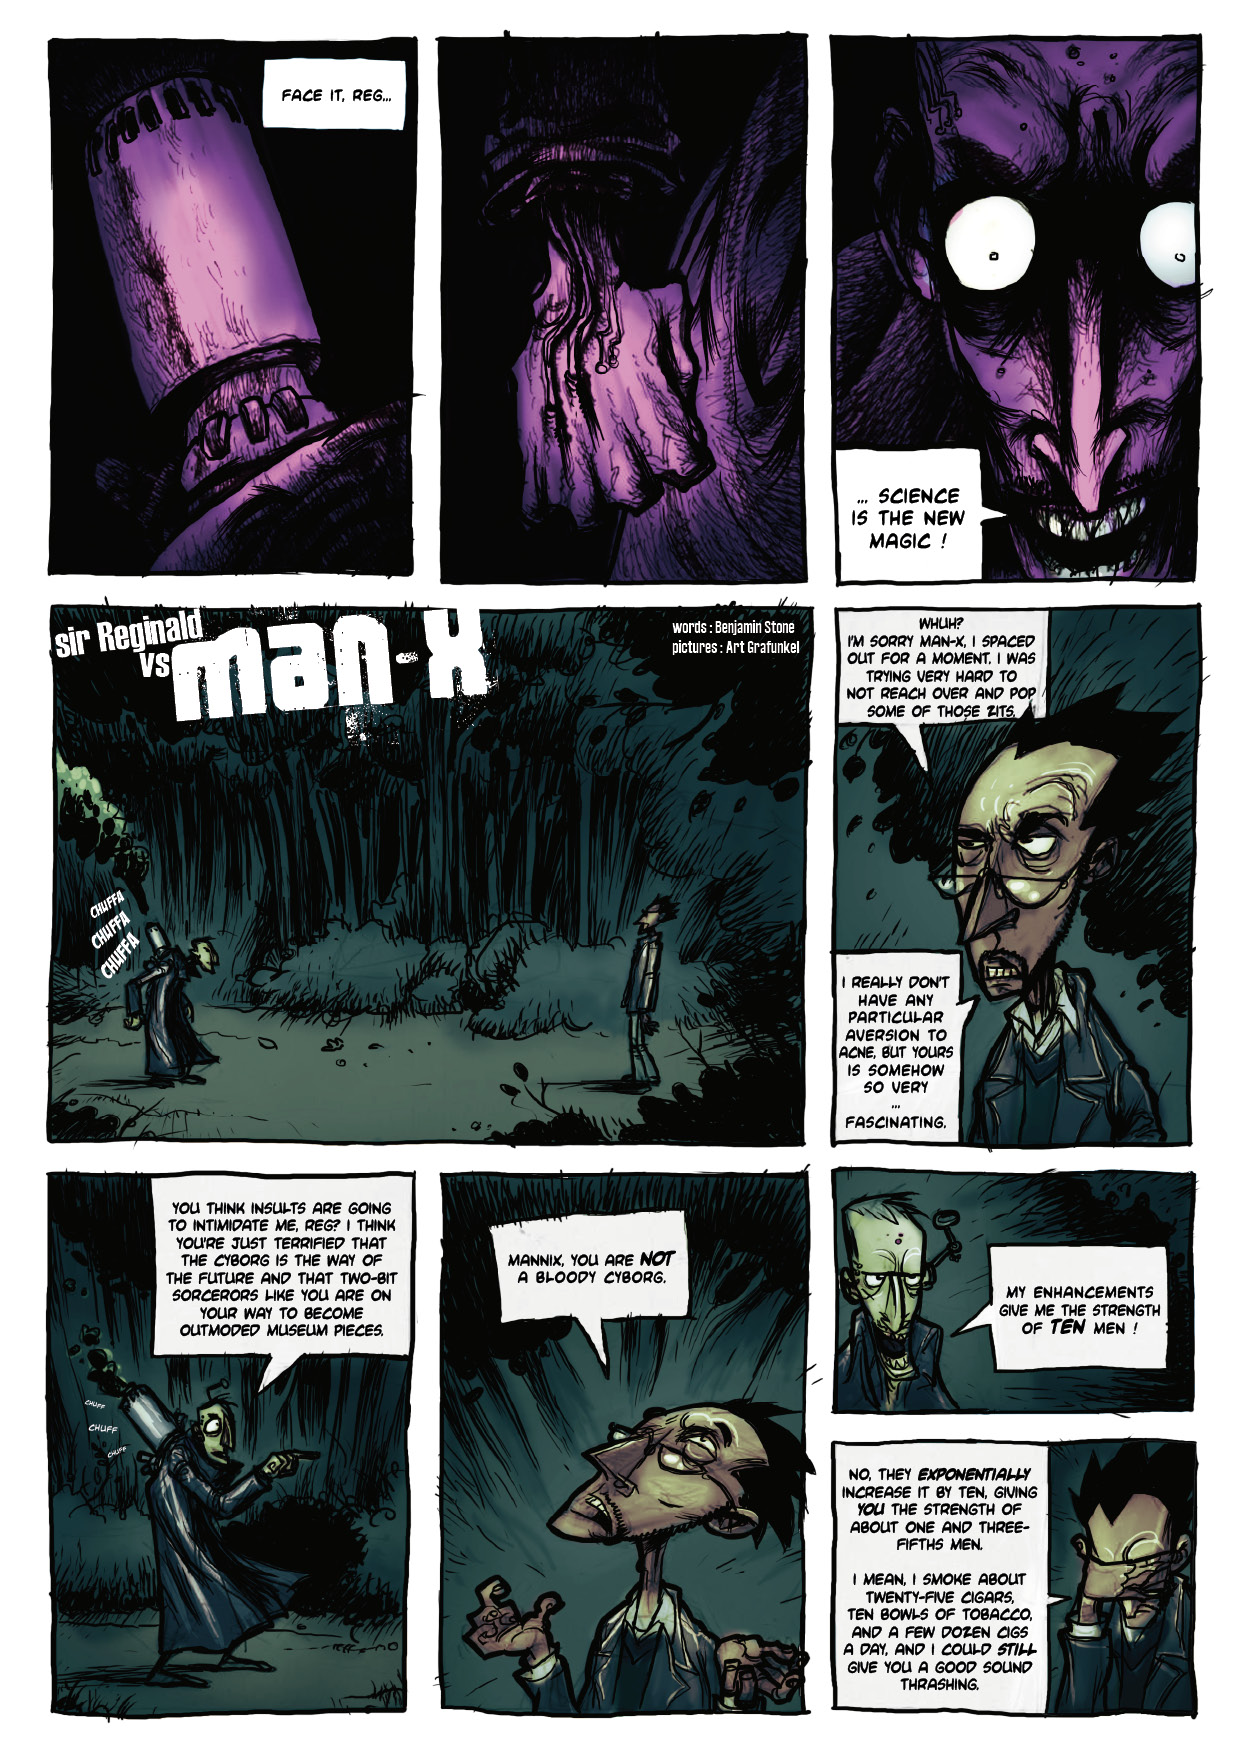 Sir Reginald vs Man-X page 1 by Art Grafunkel